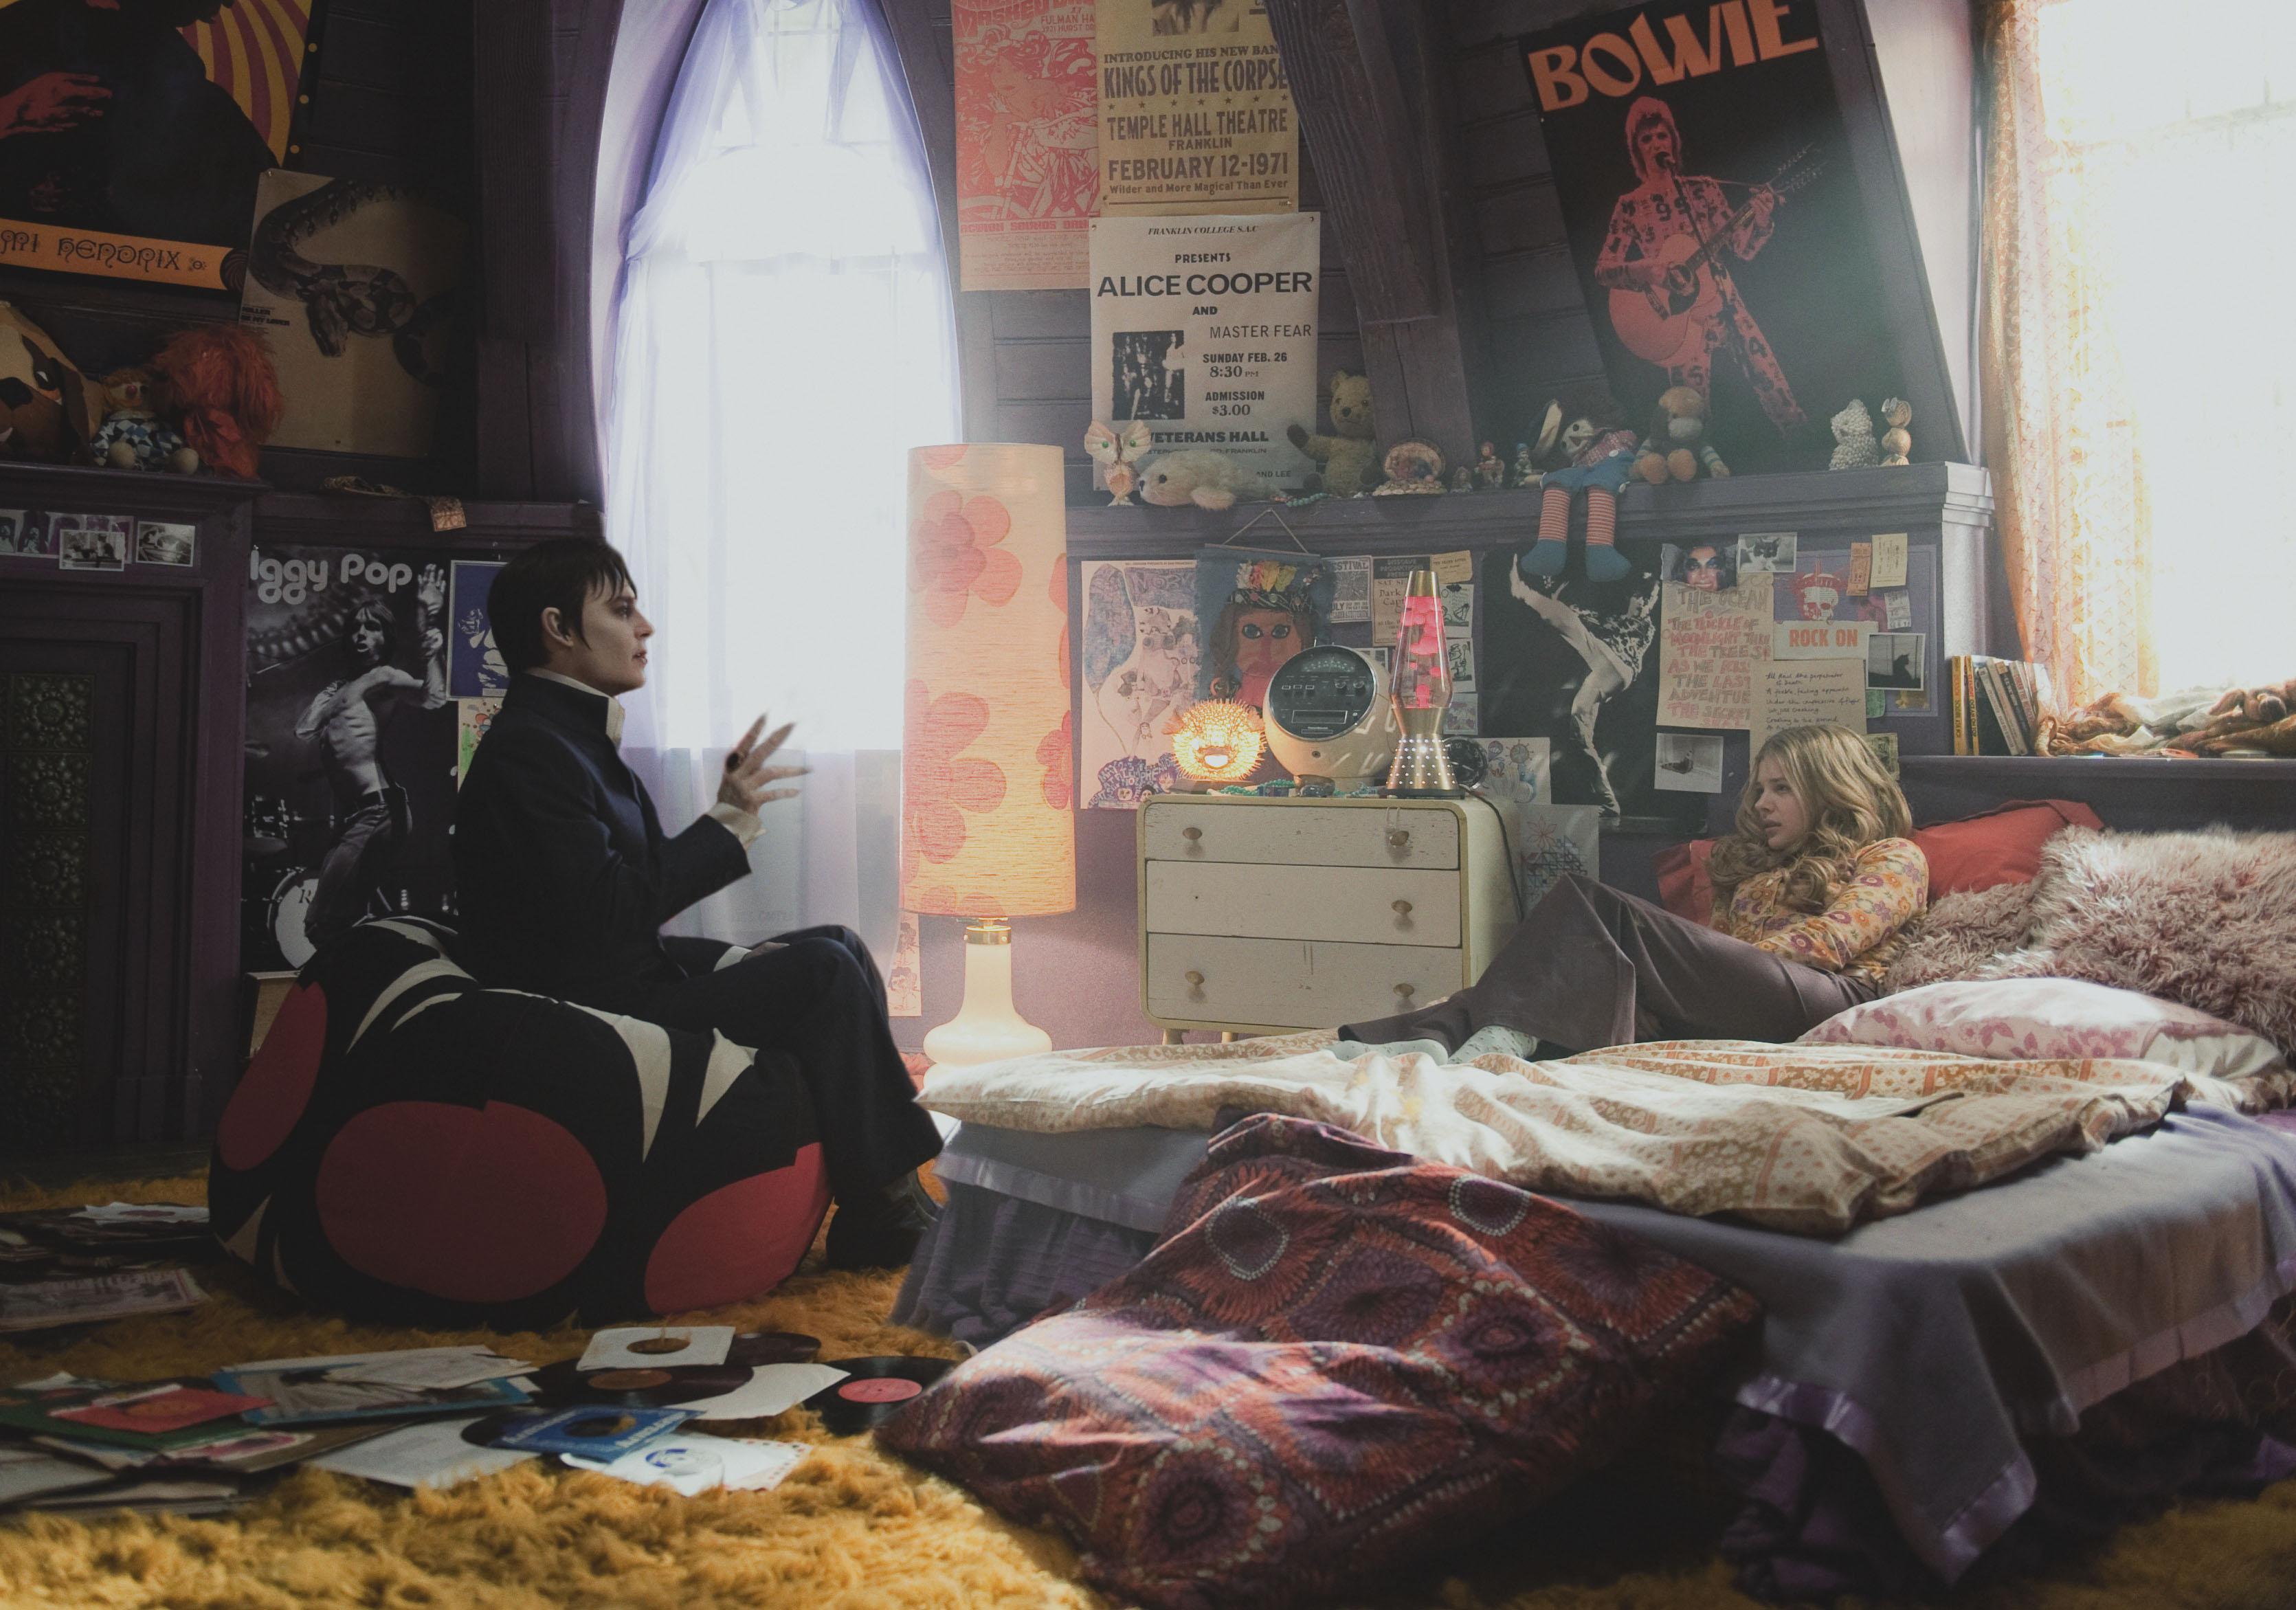 Dark Shadows, Johnny Depp, Chloe Grace Moretz, Barnabas Collins